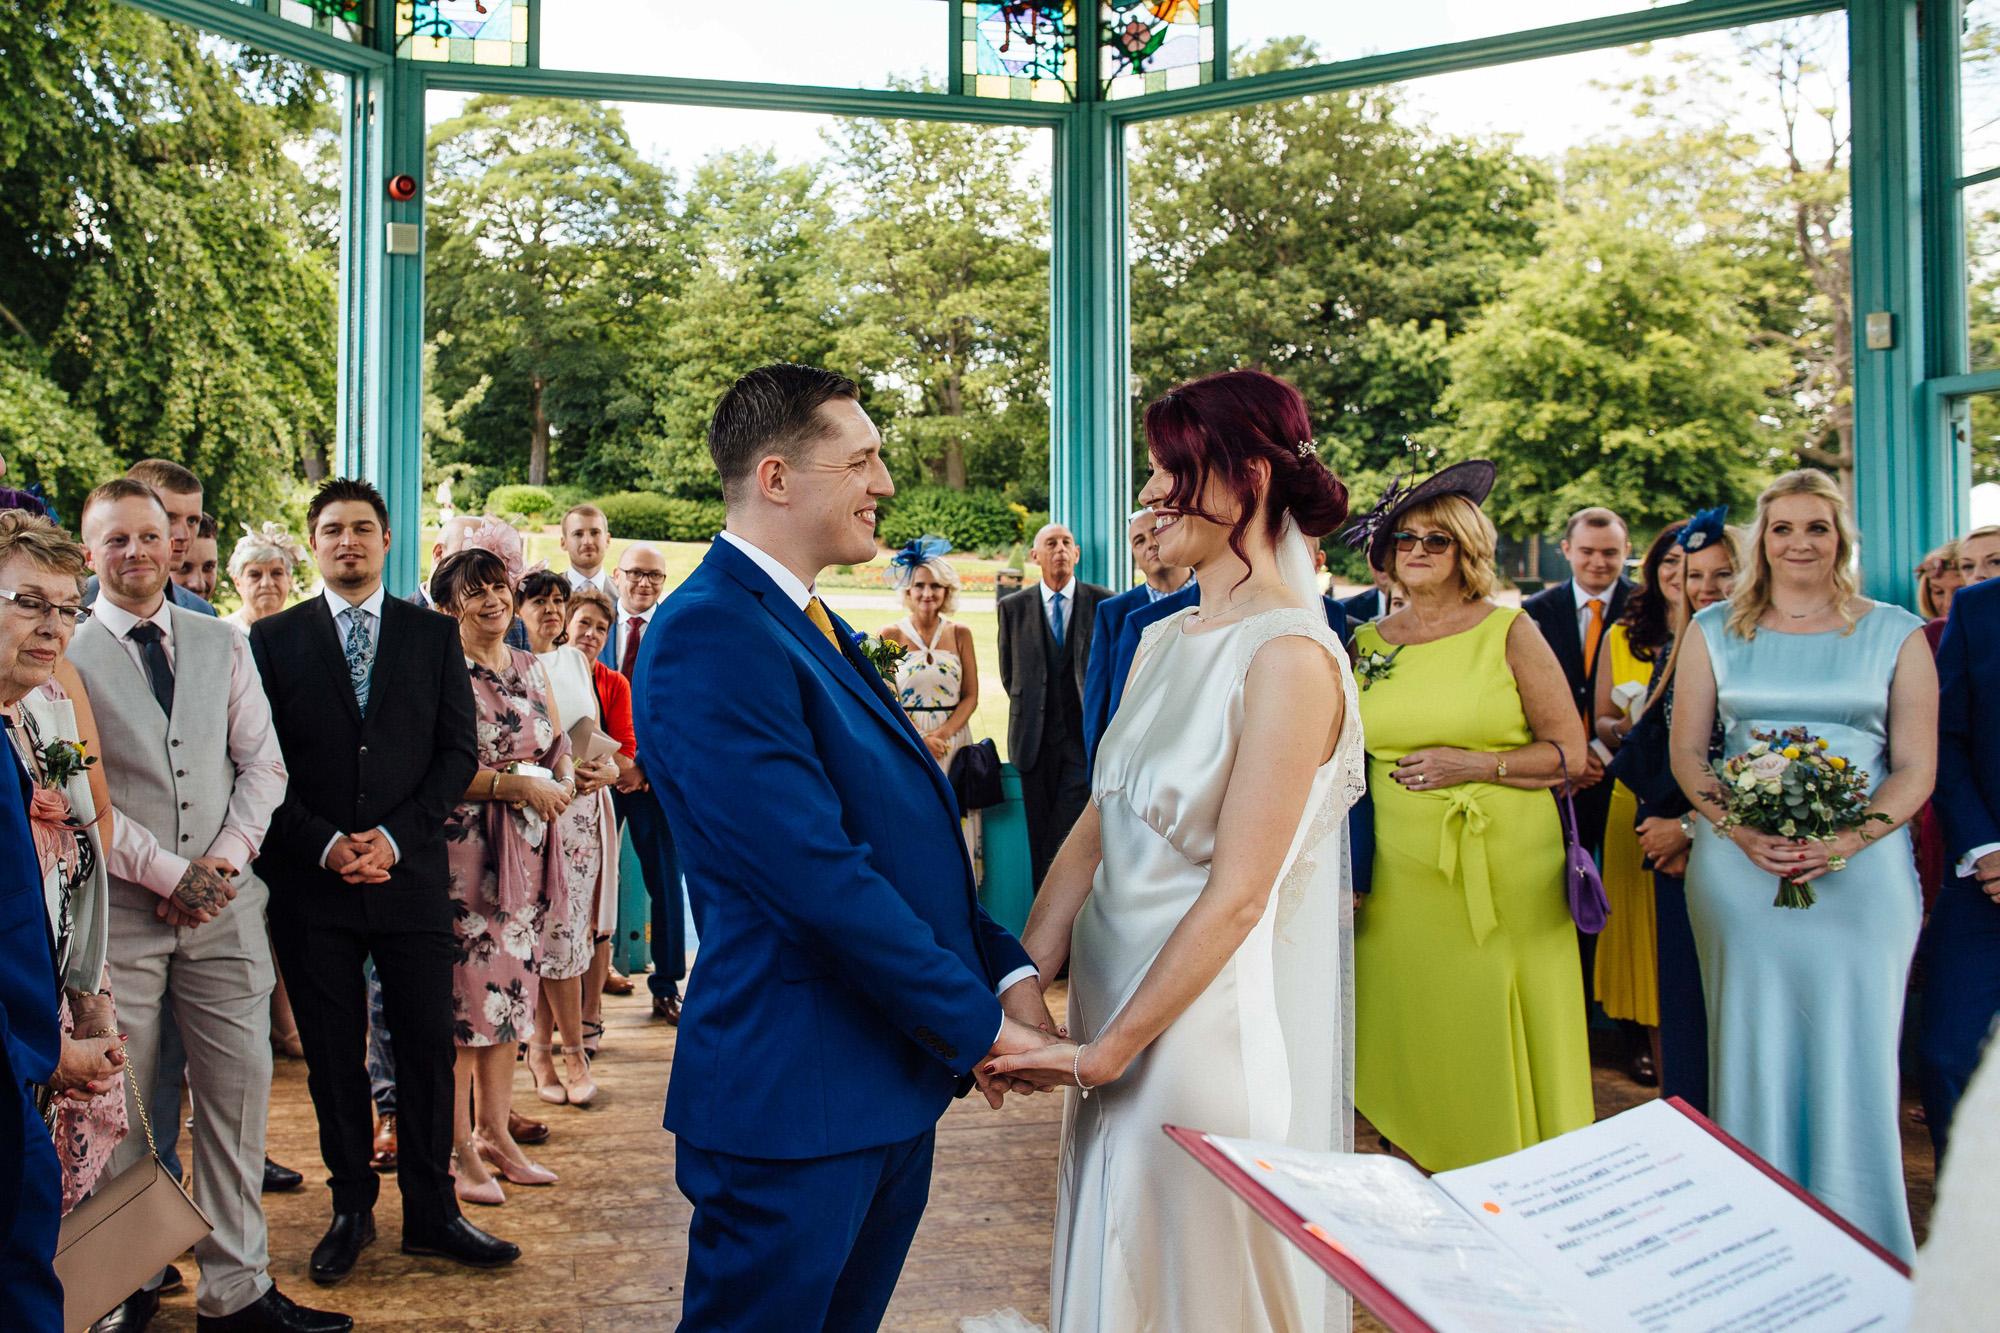 Sarah-Honeysuckle-Bias-Cut-Silk-Vintage-Inspired-Wedding-Gown-Sheffield-Wedding-Kate-Beaumont-16.jpg